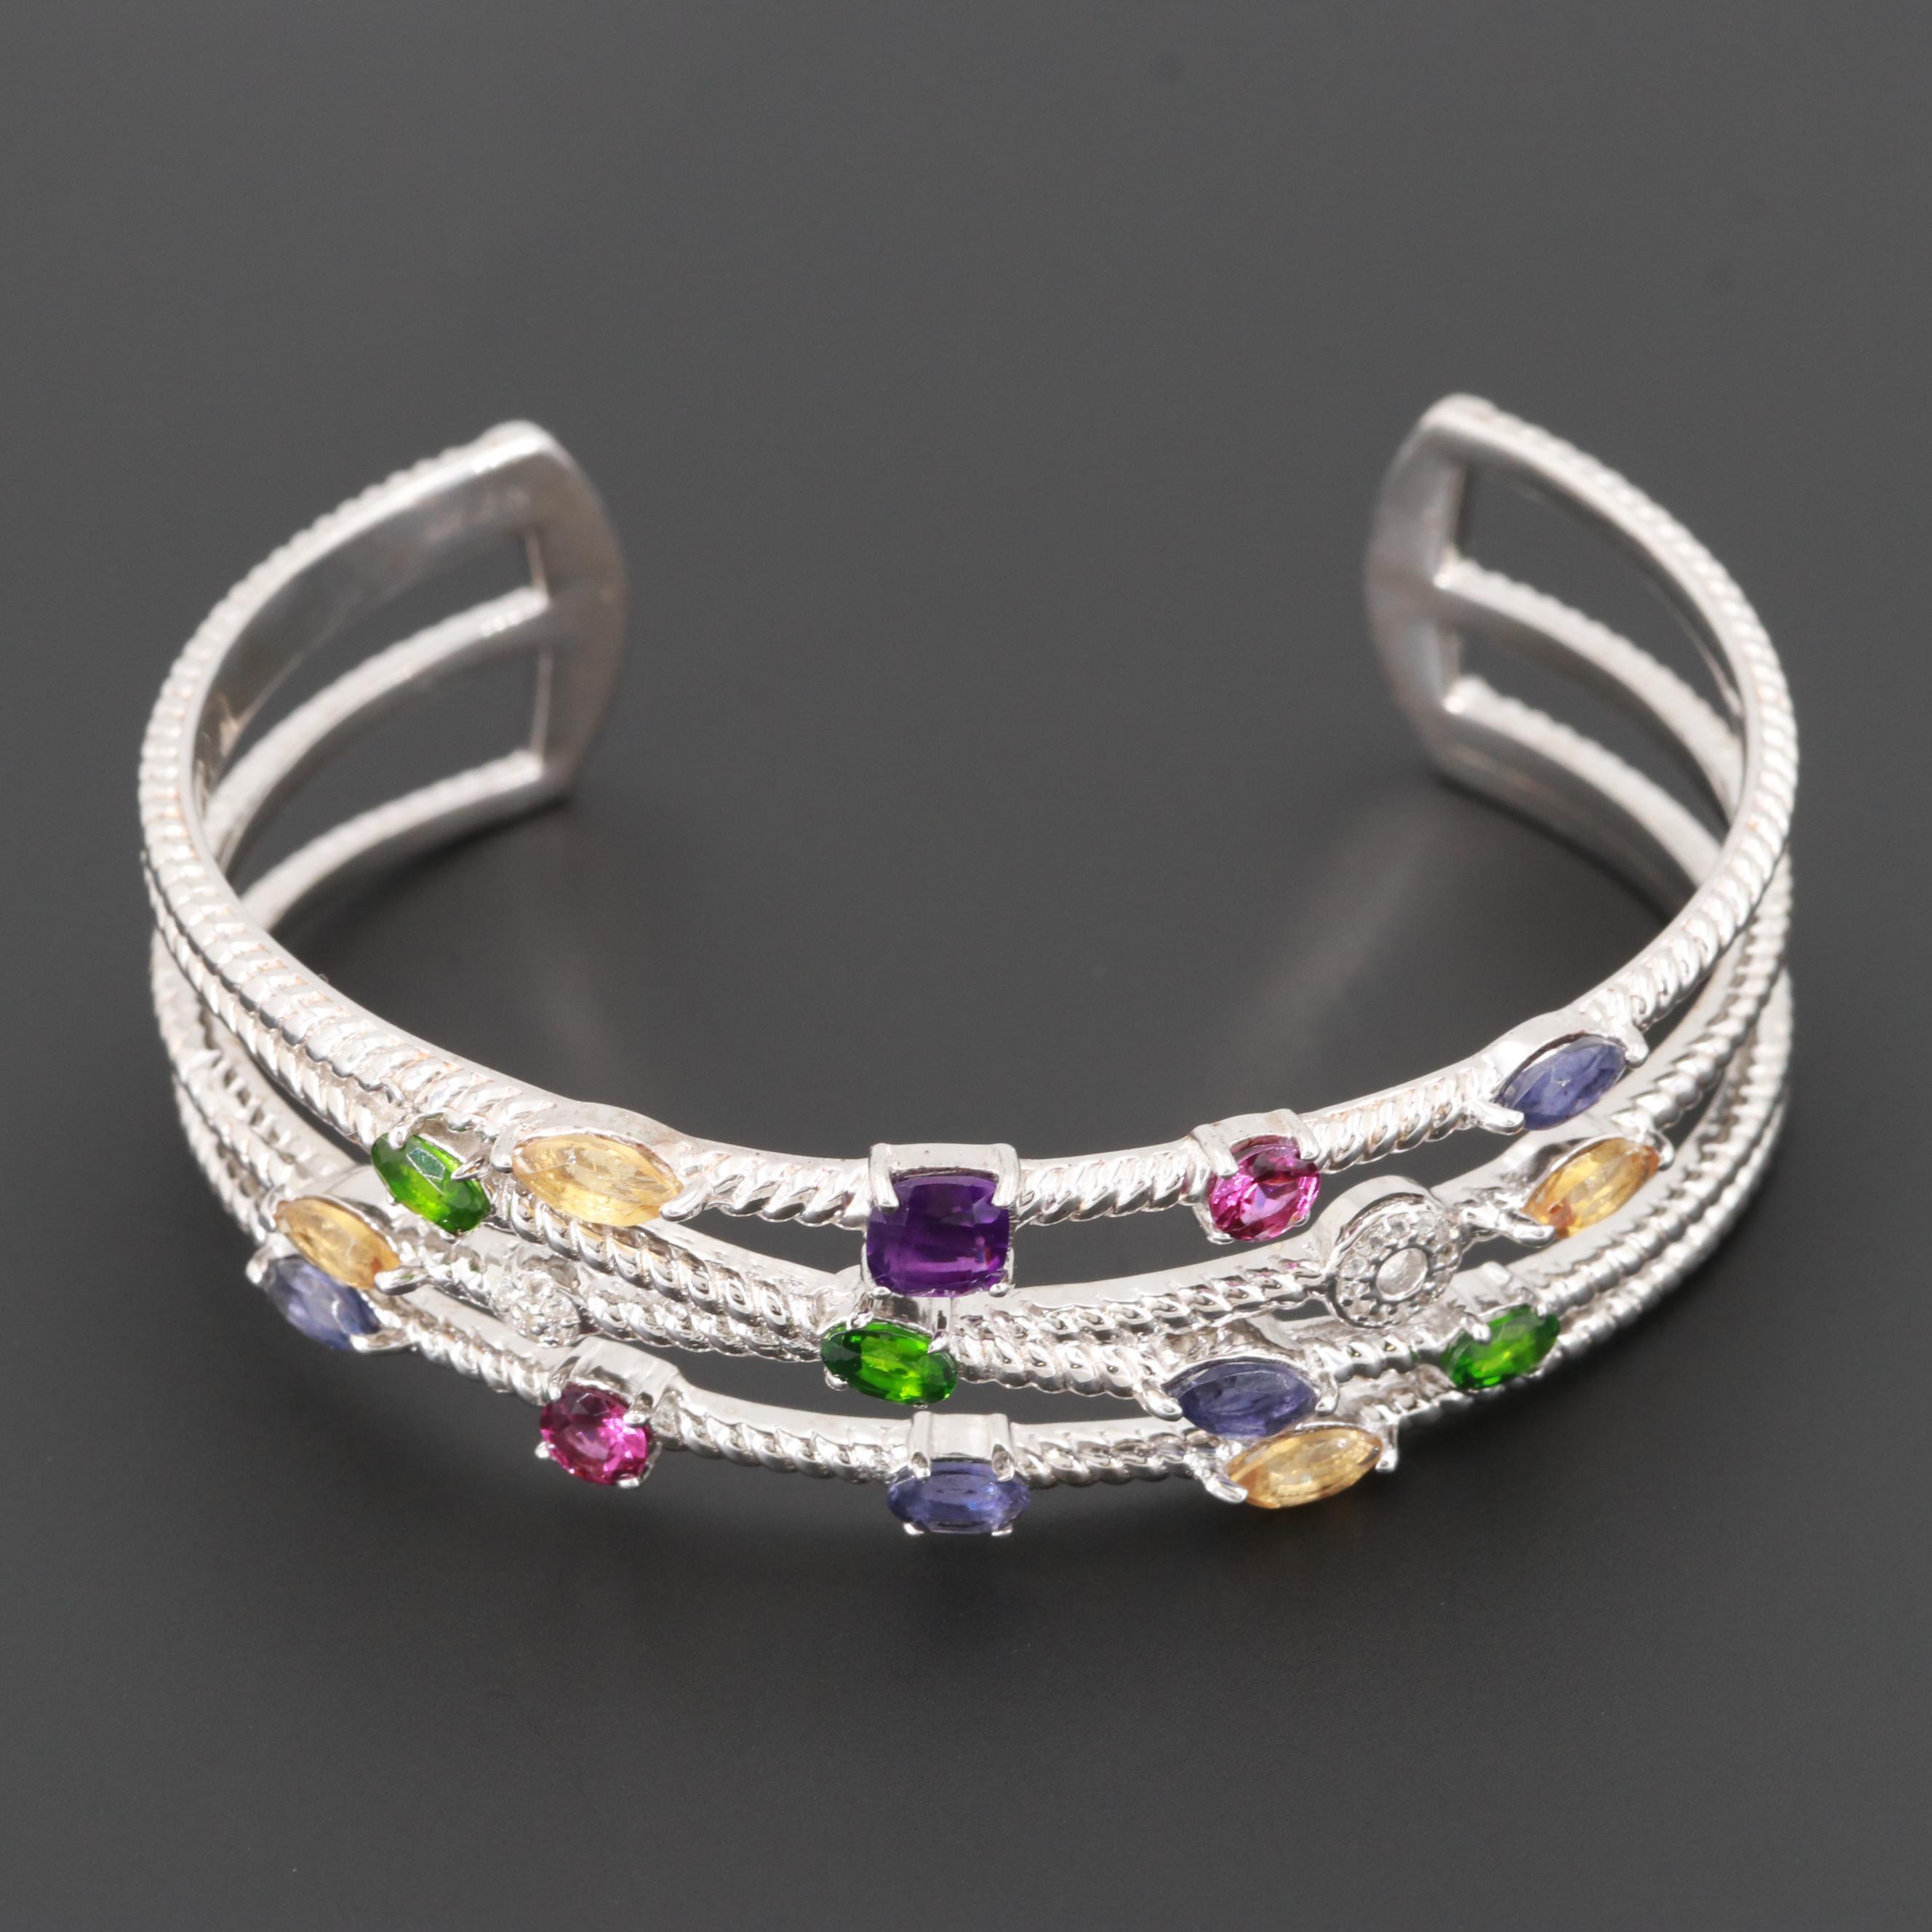 Sterling Silver Amethyst, Chrome Diopside and Rhodolite Garnet Cuff Bracelet